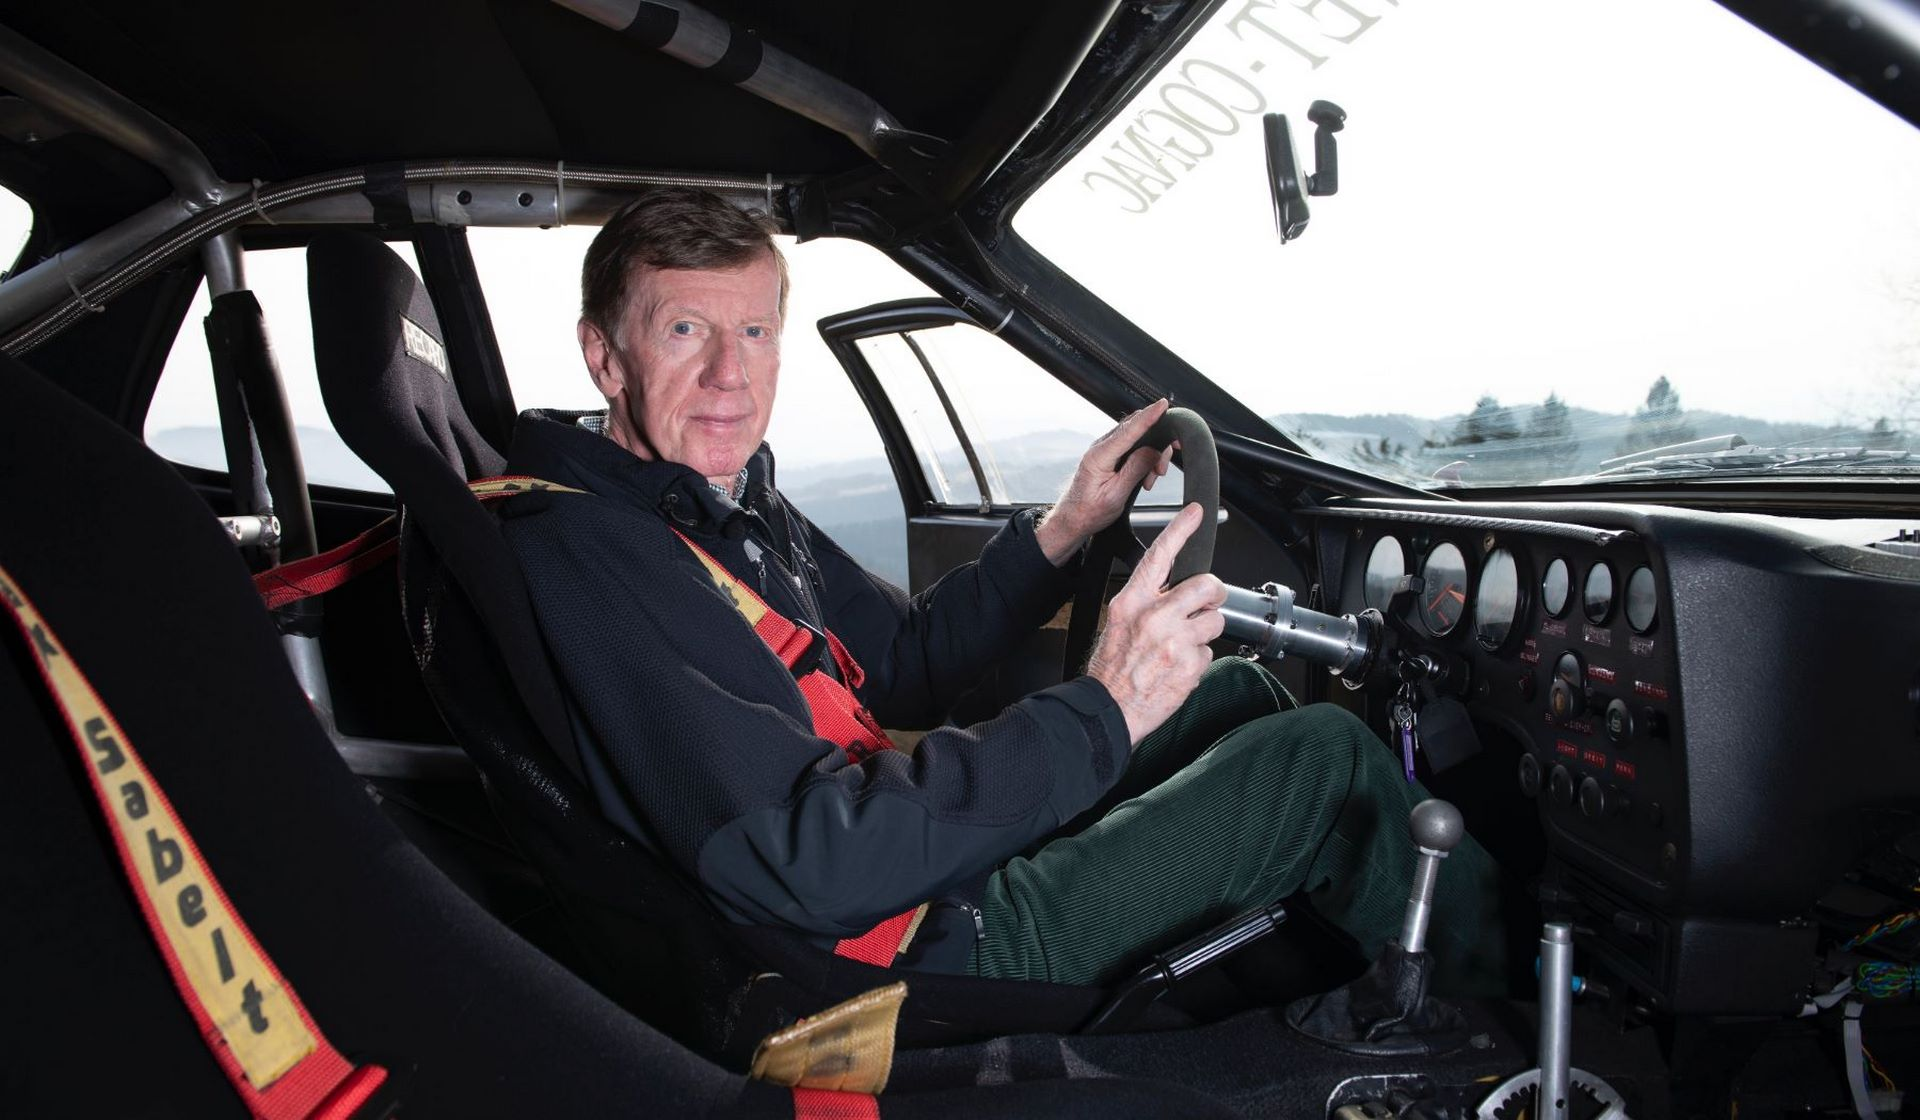 Porsche-924-Carrera-GTS-rally-car-Walter-Rohrl-13